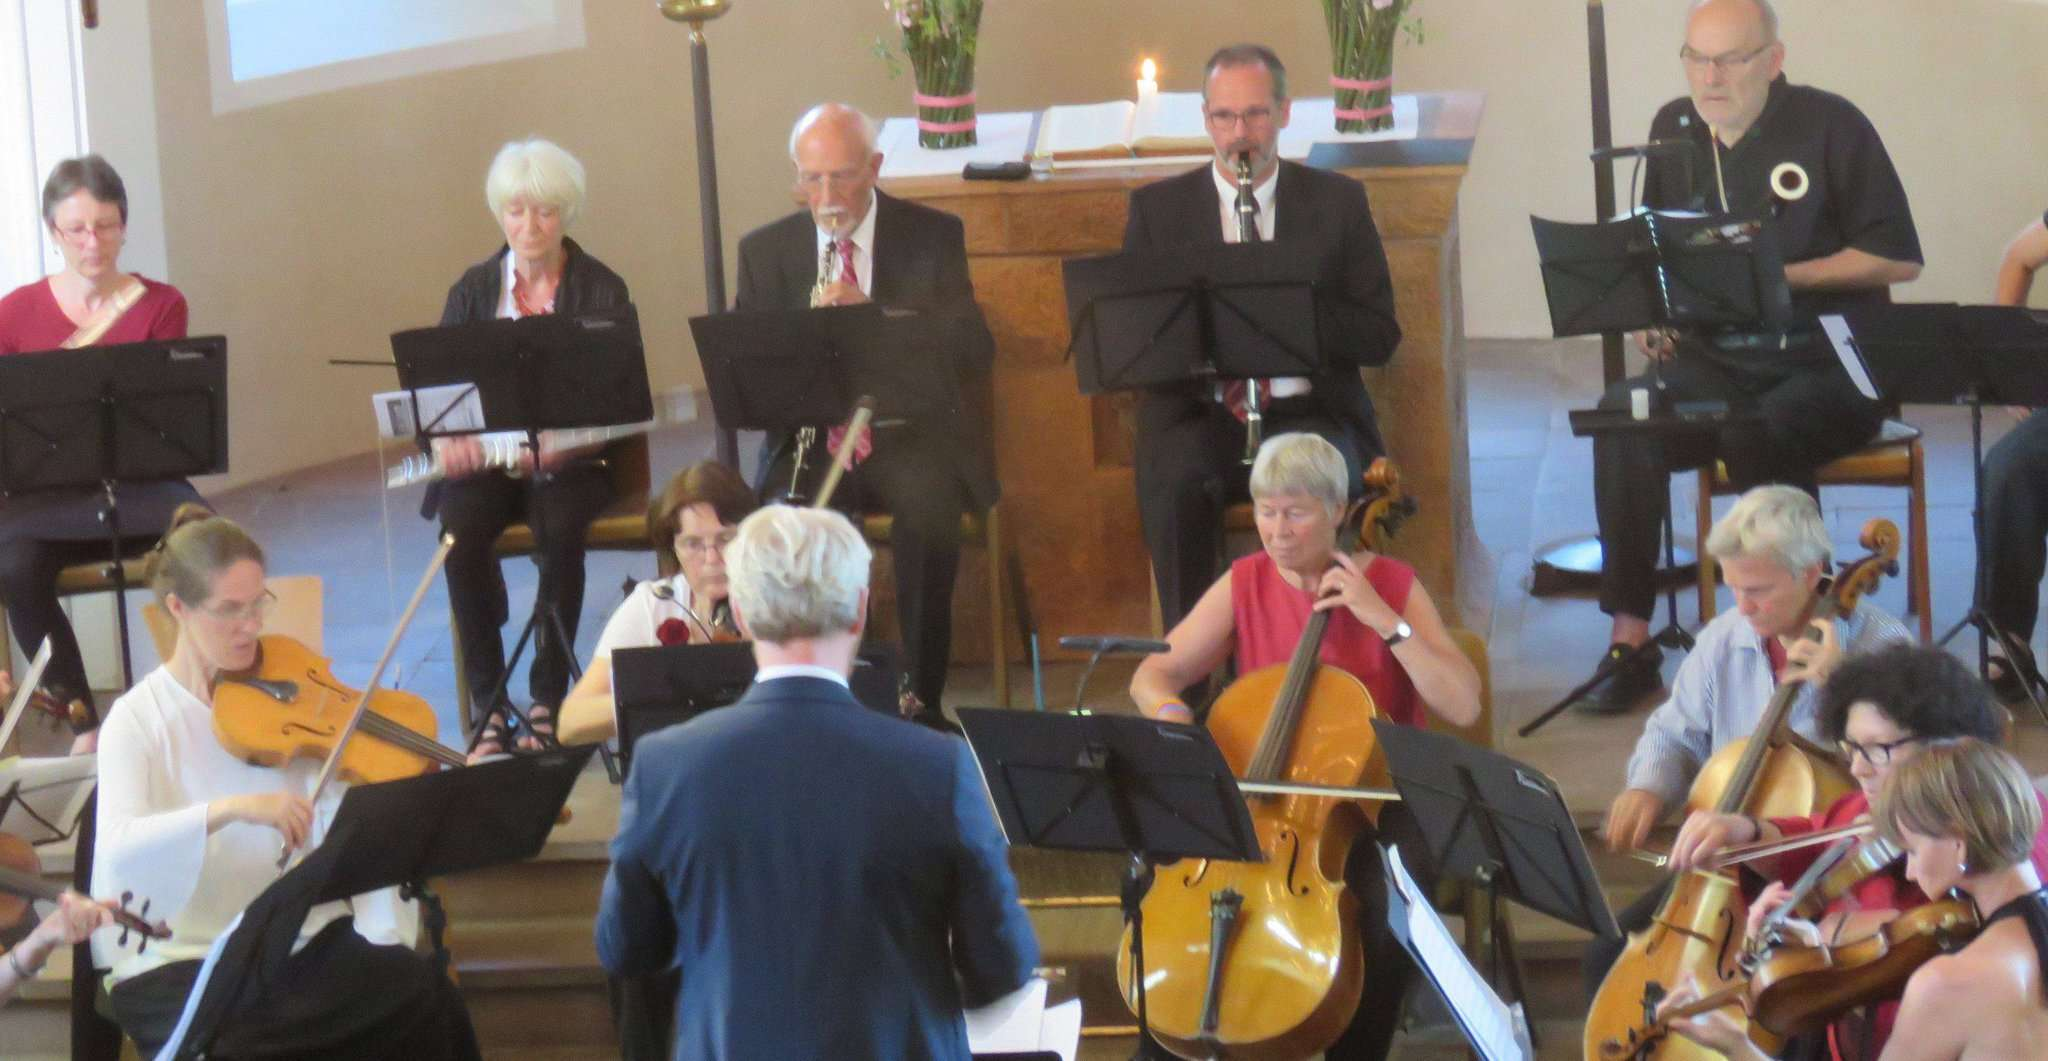 Souverän und locker dirigierte Clive Ford das große Jubiläumskonzert des Ottersberger Kammerorchesters. Foto: Elke Keppler-Rosenau